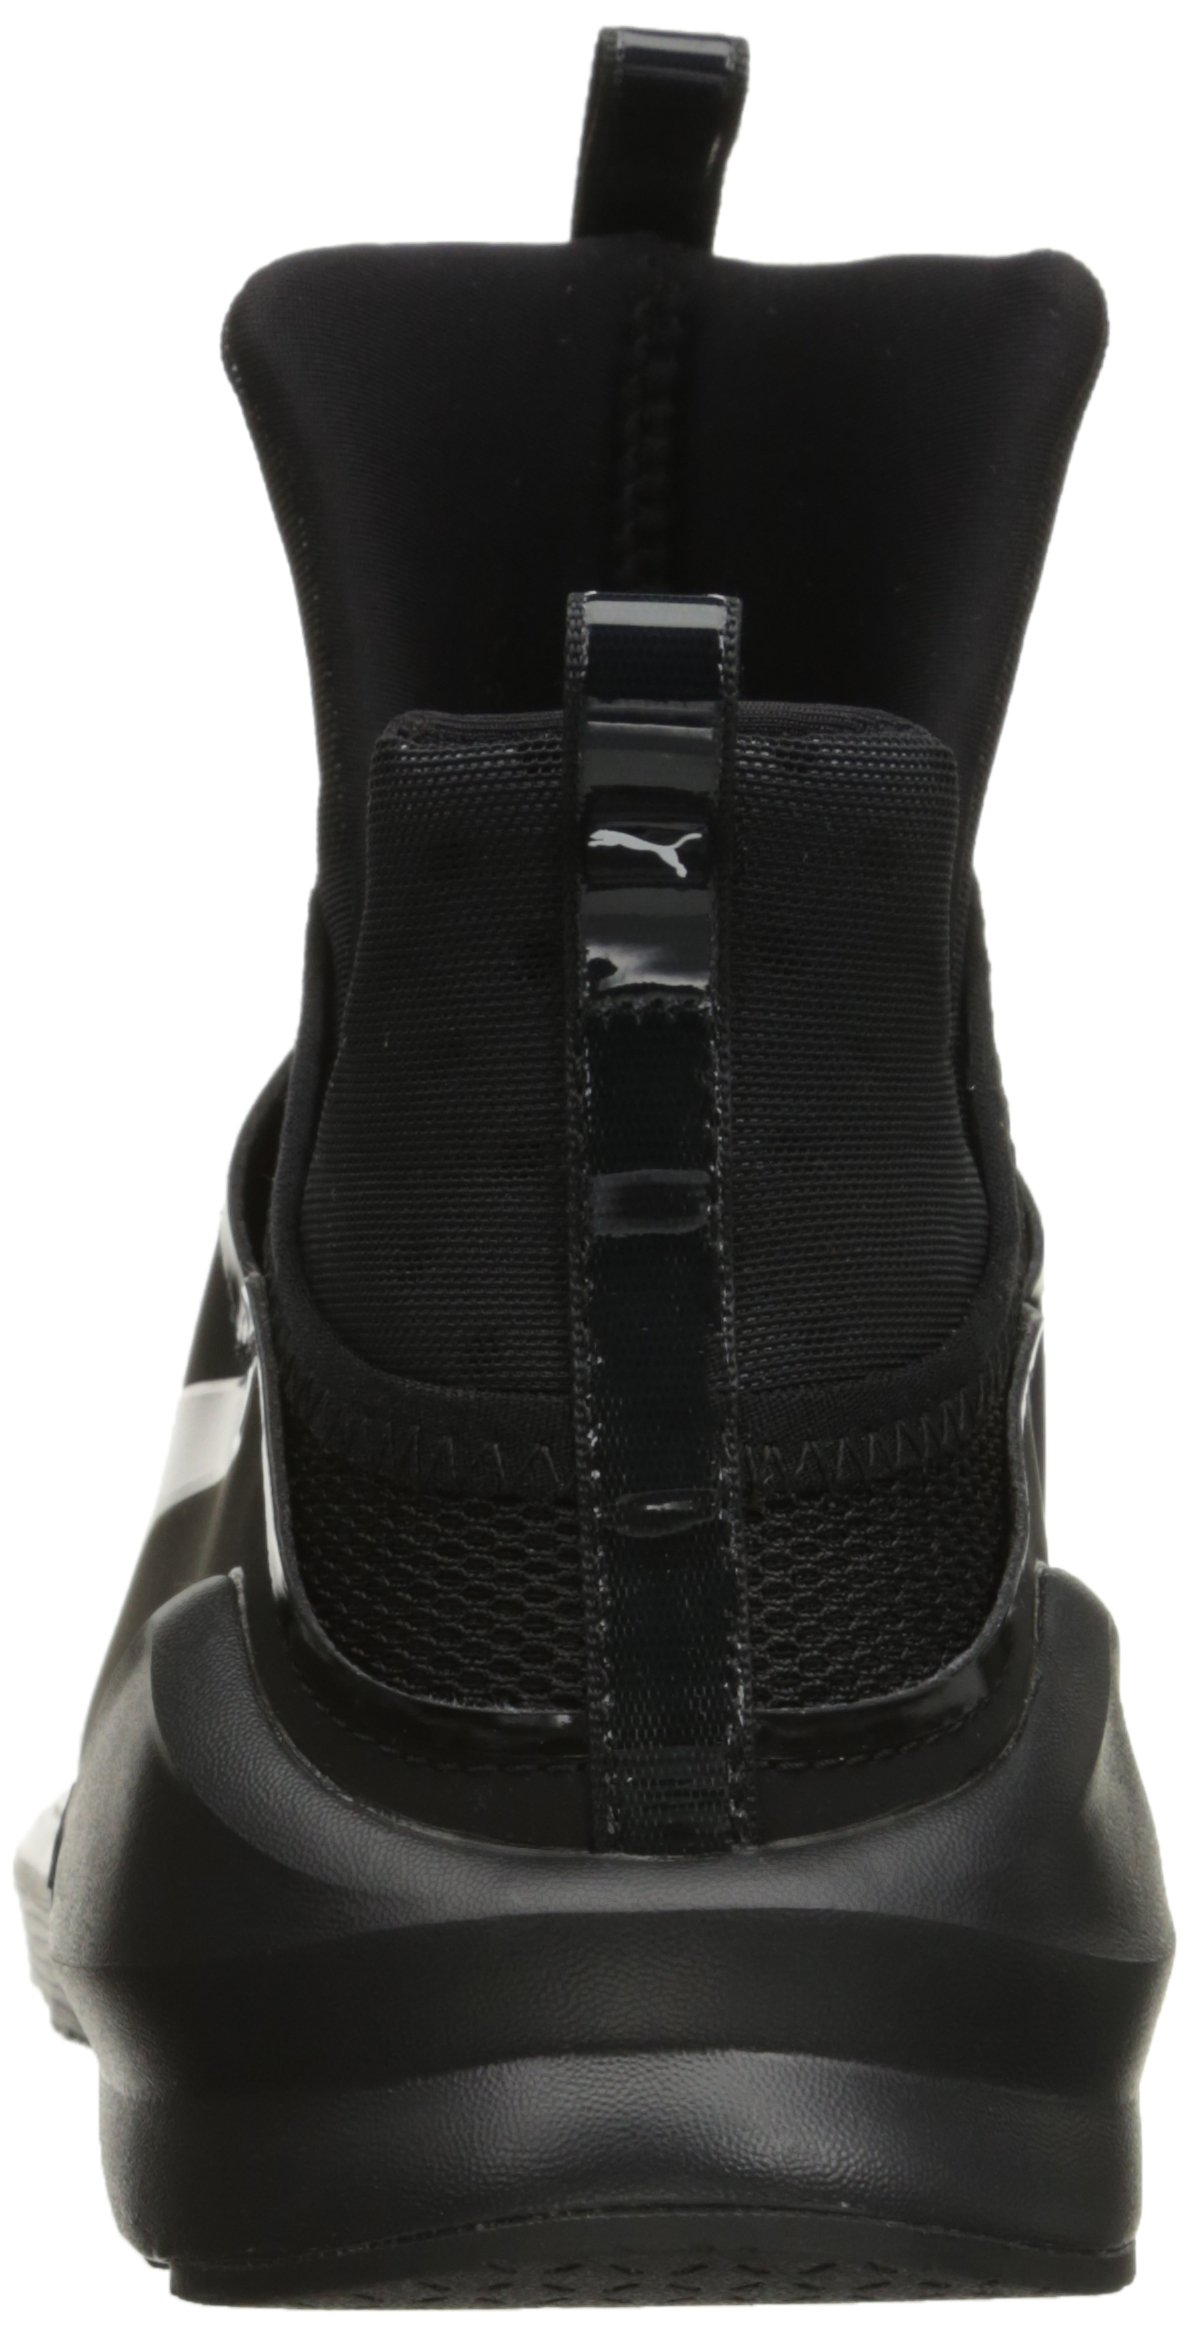 PUMA Women's Fierce Core Cross-Trainer Shoe, Black Black, 9 M US by PUMA (Image #2)